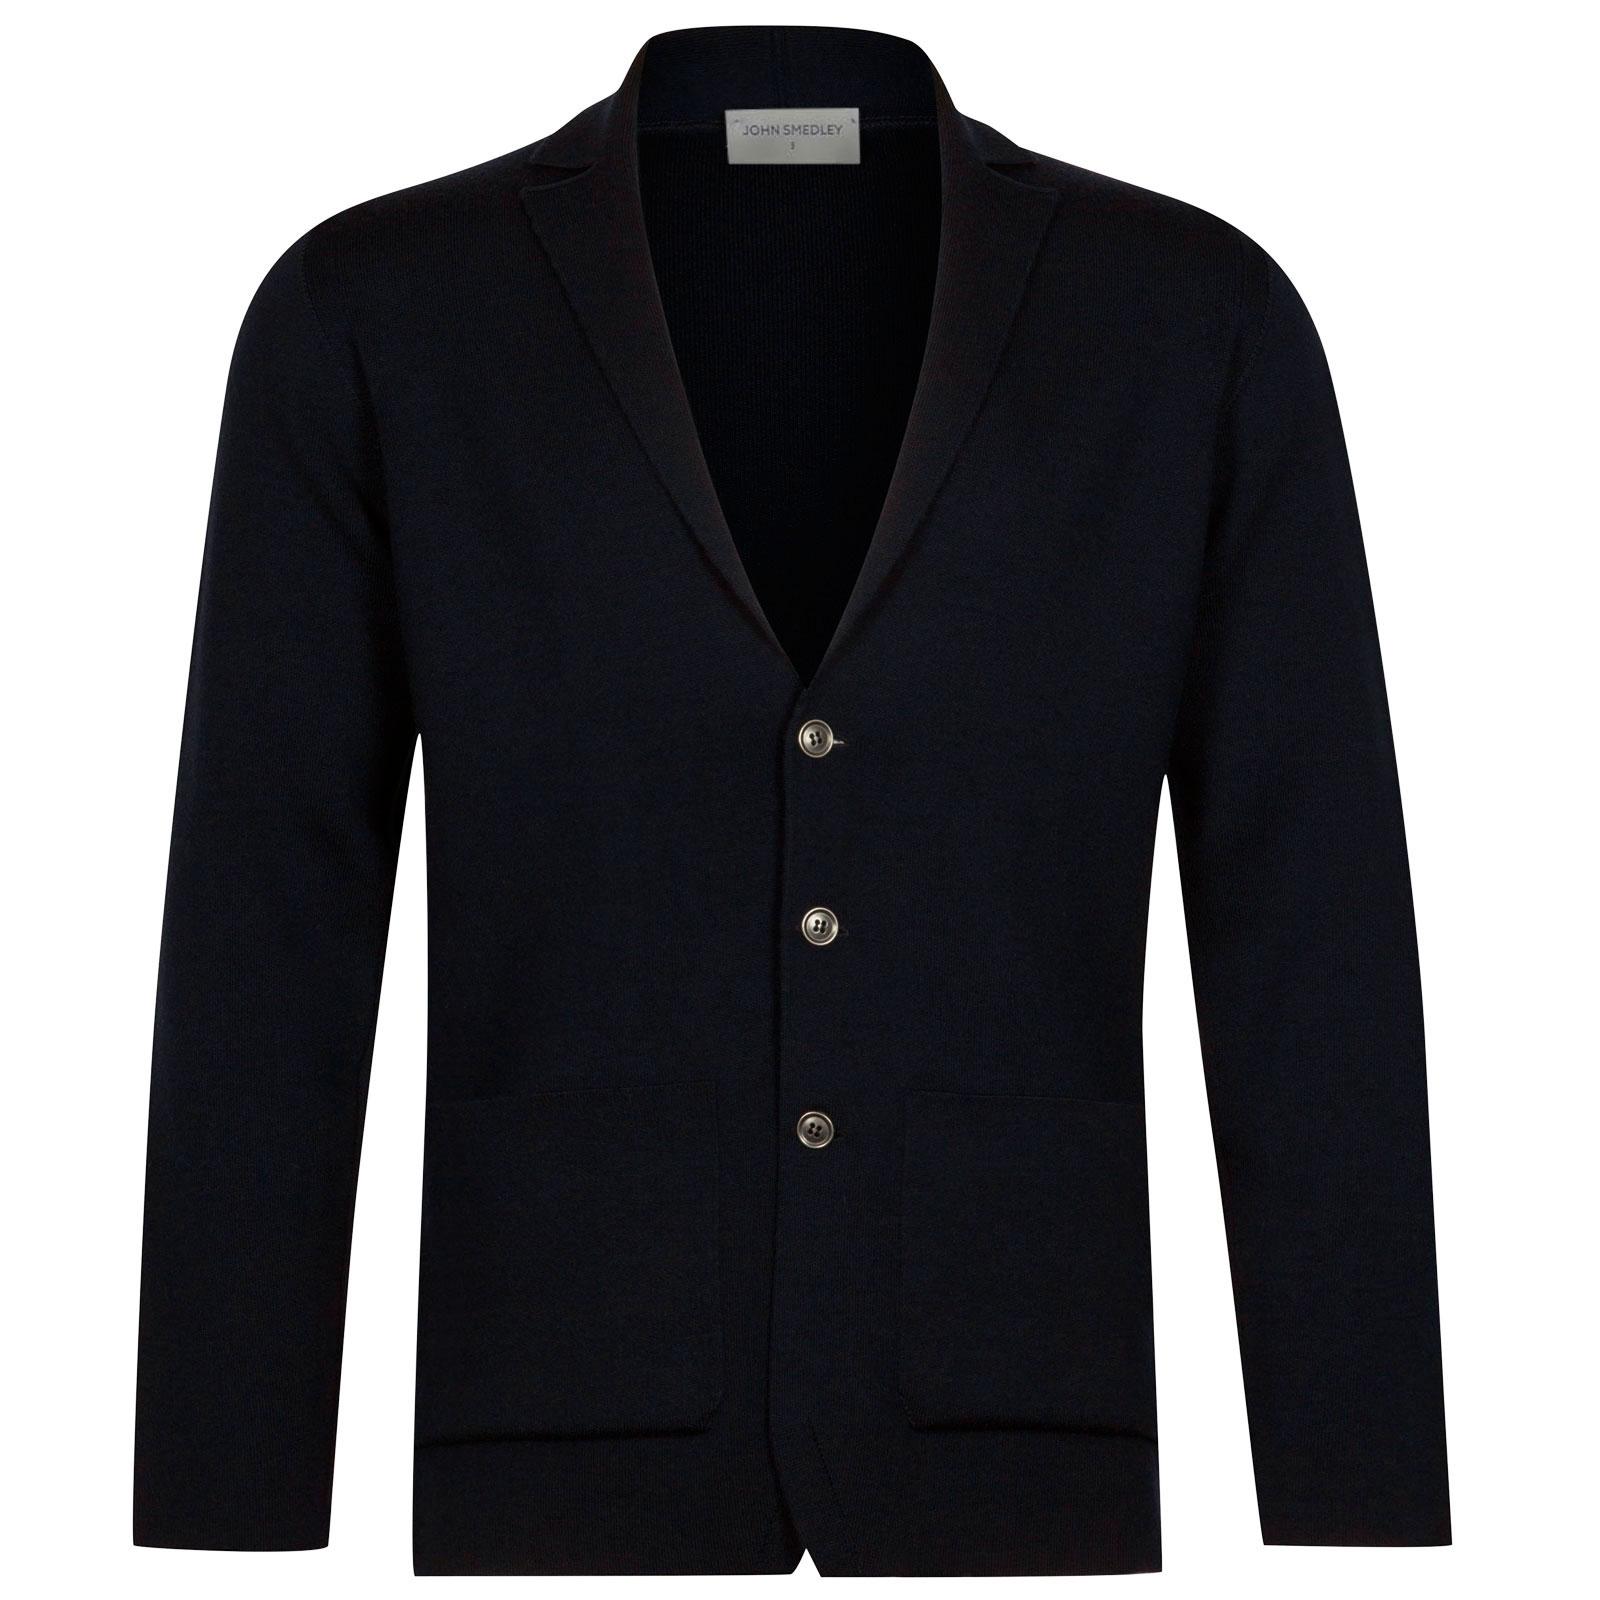 John Smedley Oxland Merino Wool Jacket in Midnight-XXL